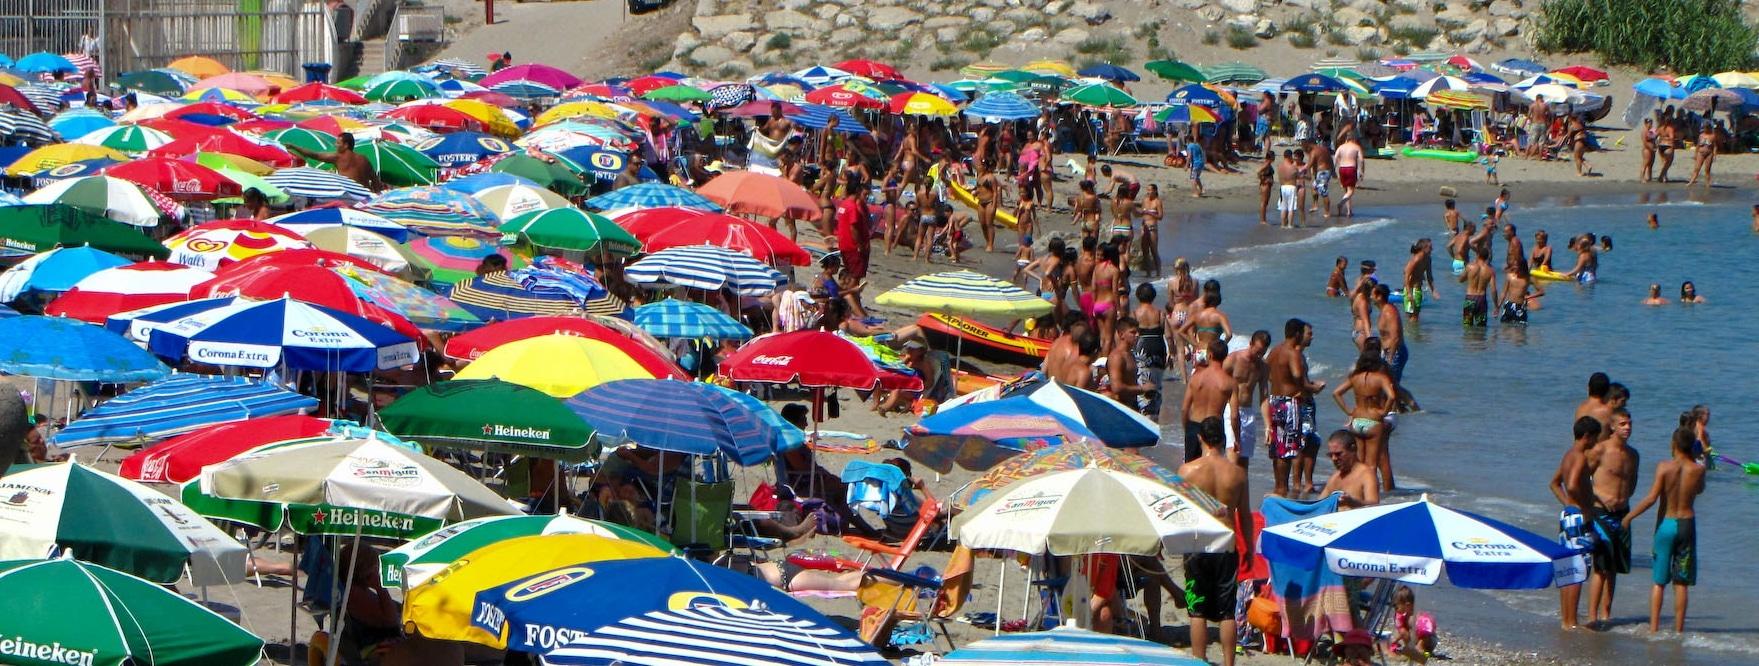 beaches-2_25762495408_o